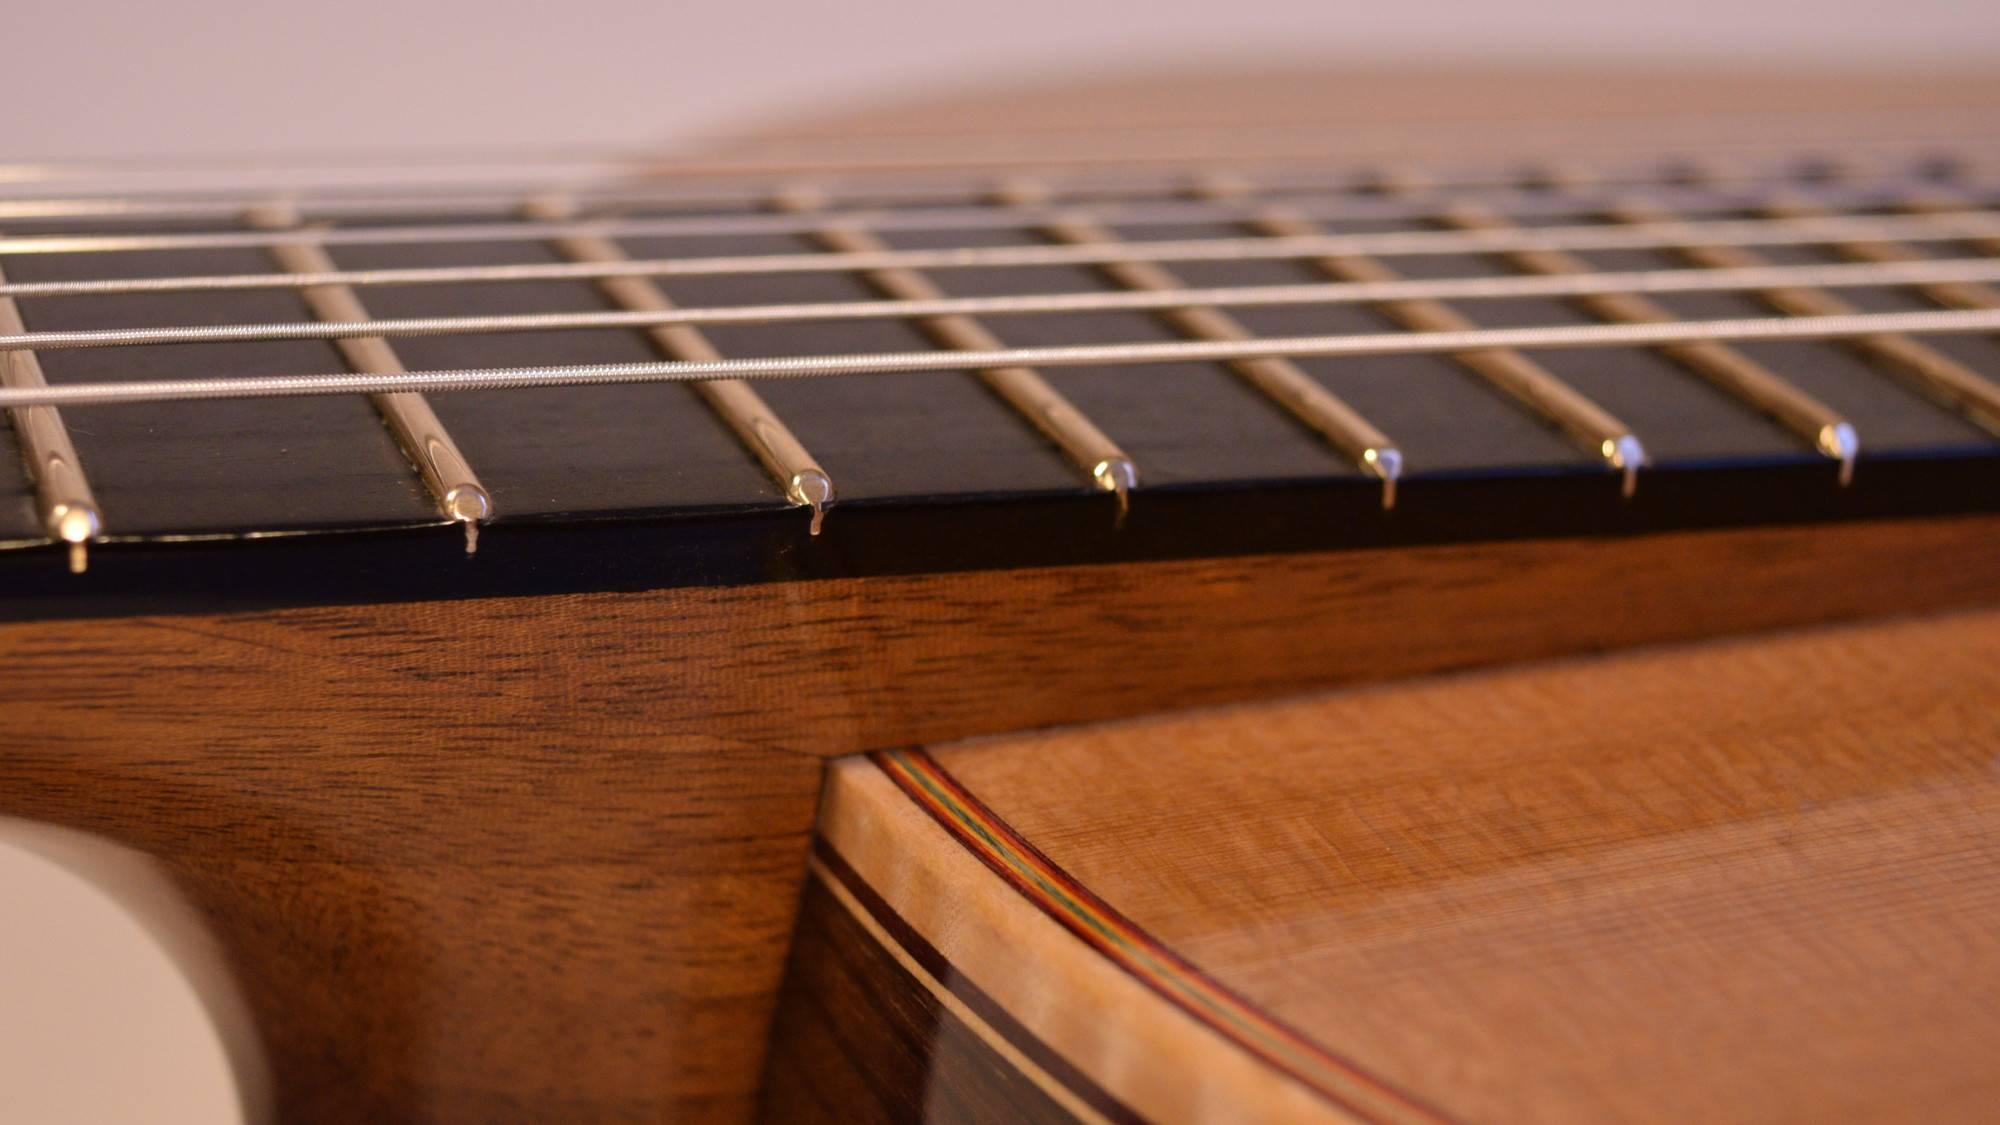 Fingerboard Elevation